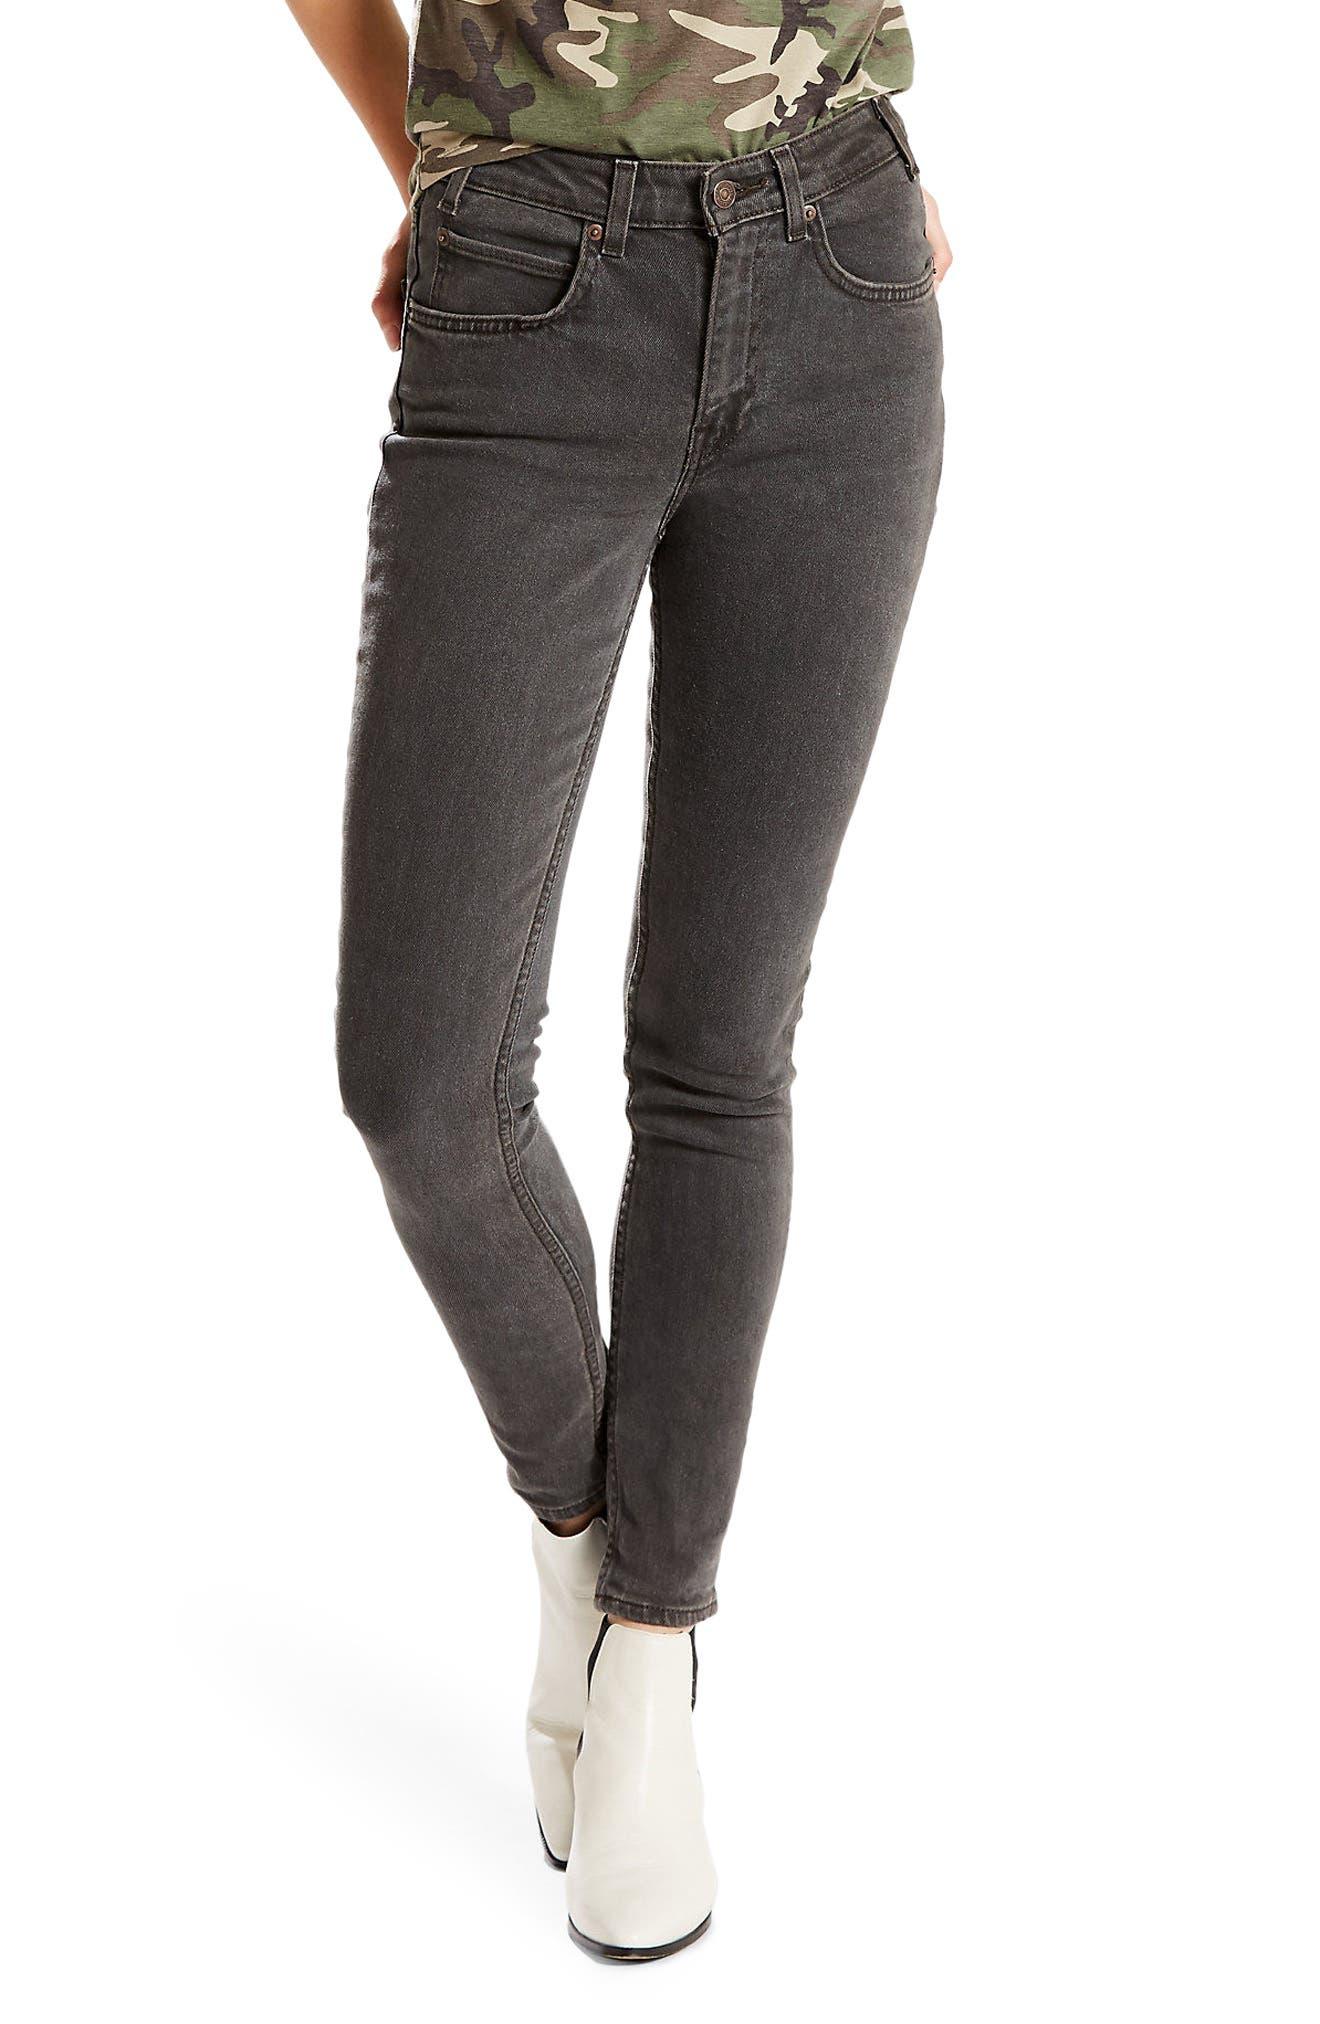 Alternate Image 1 Selected - Levi's® Orange Tab 721 High Waist Skinny Jeans (Black Widow)